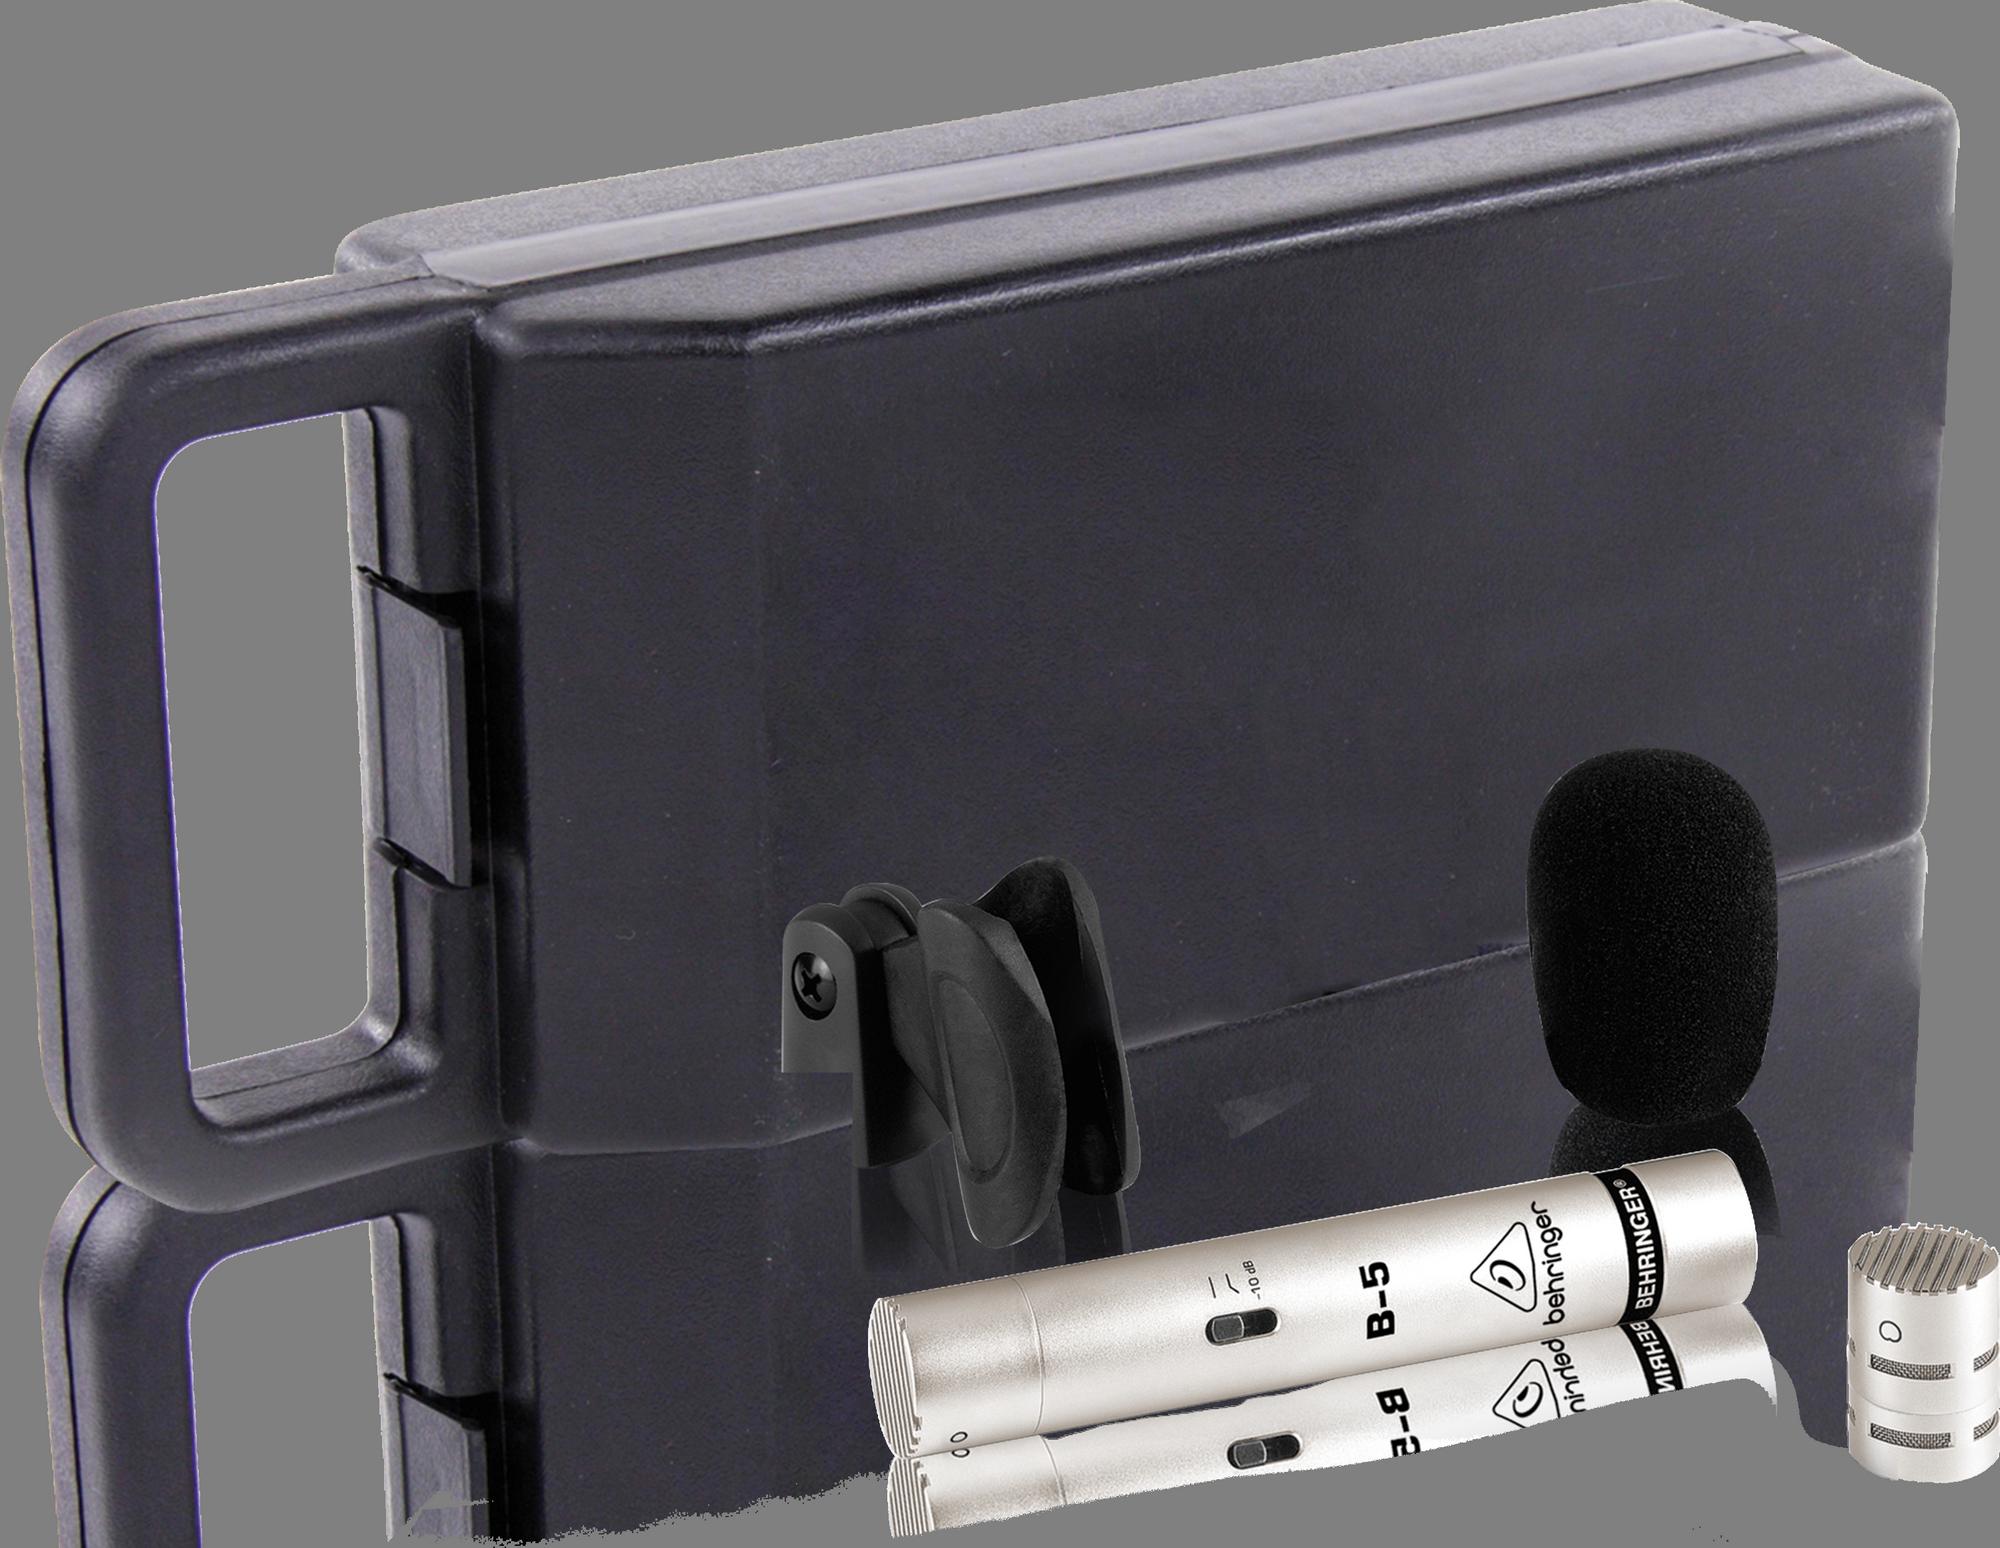 Micro Behringer B5 - Condenser Micro Single Small Diaphragm | HayAudio.com